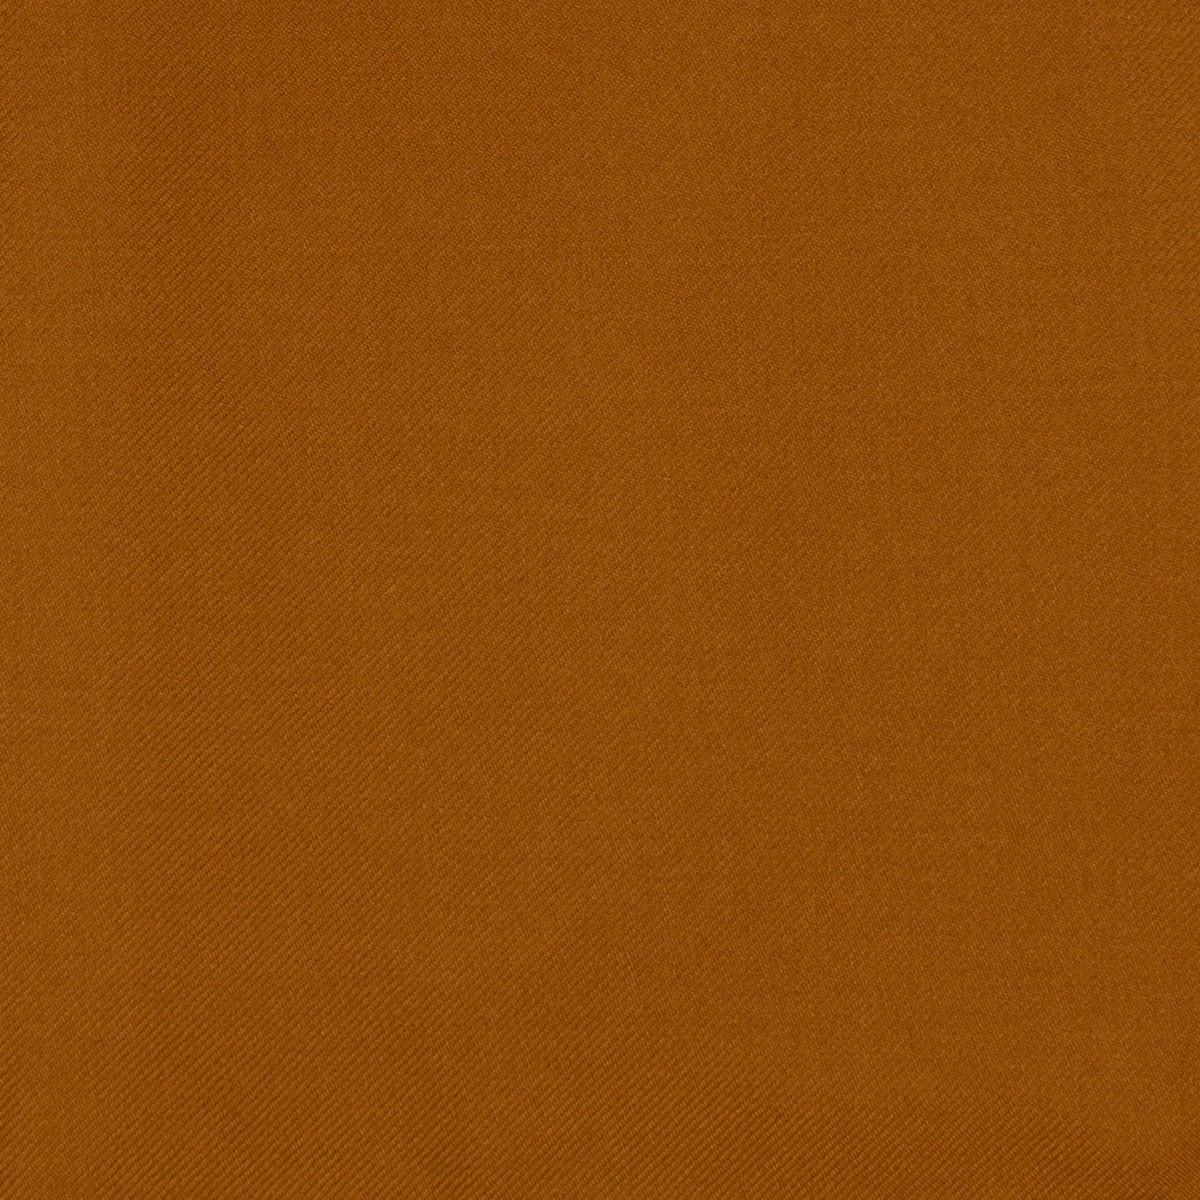 Saffron Ancient Heavy Weight Fabric